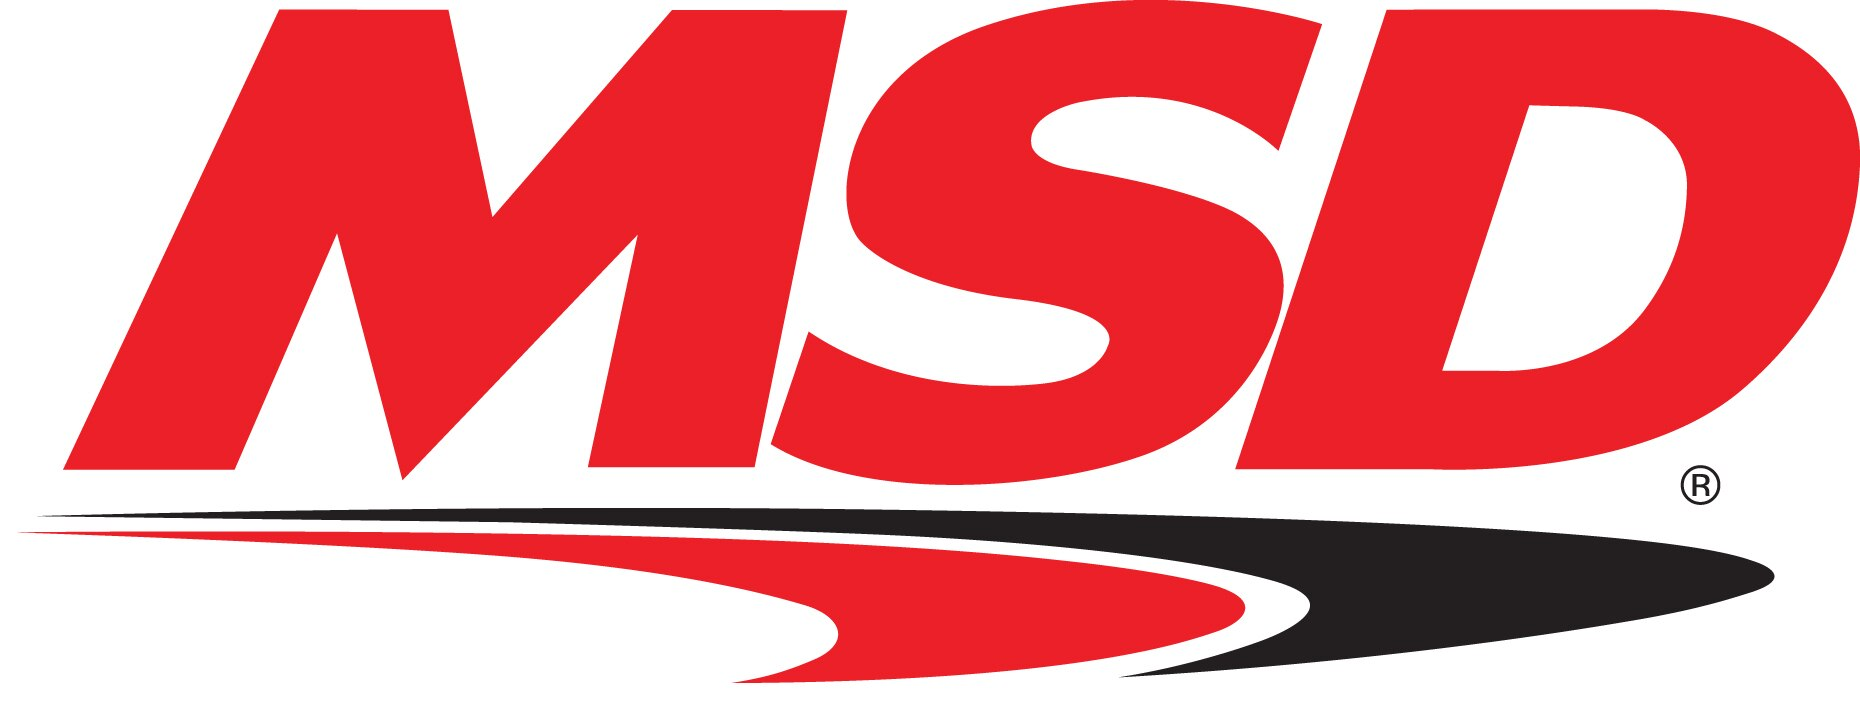 MSD 8352 Distributors